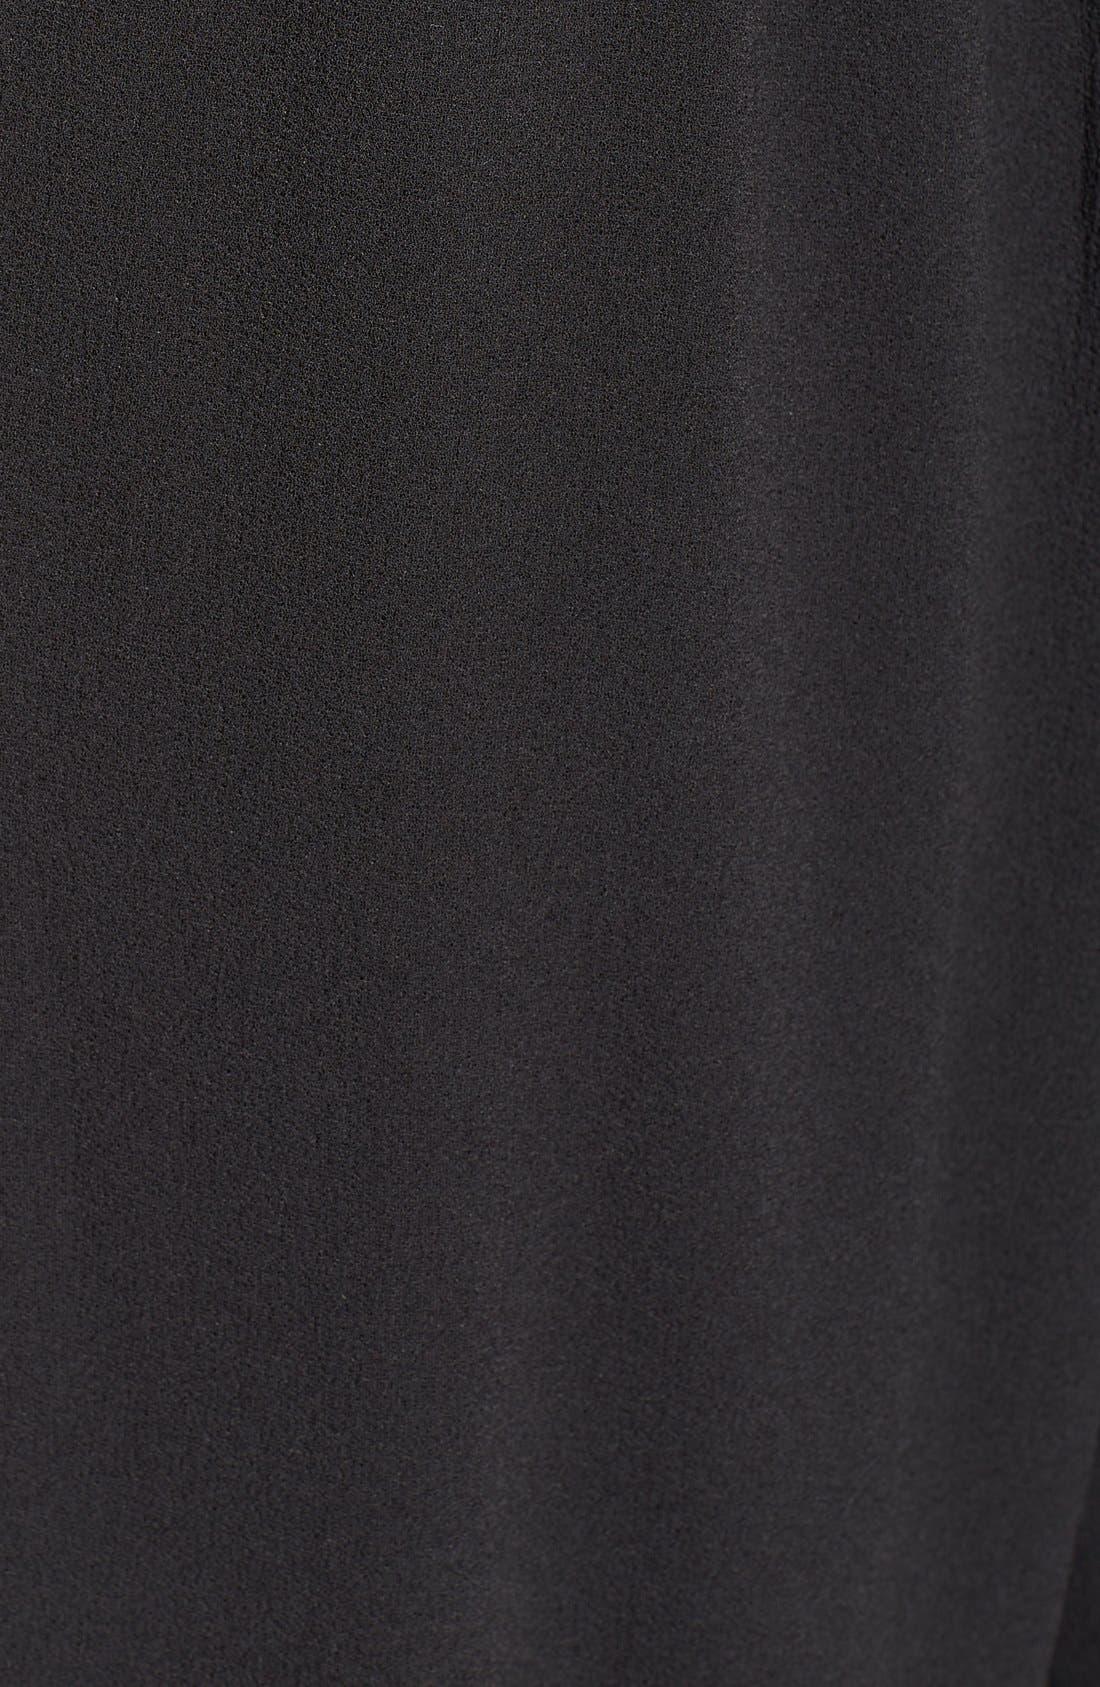 MELISSA MCCARTHY SEVEN7, Zip Pocket Harem Pants, Alternate thumbnail 2, color, 001